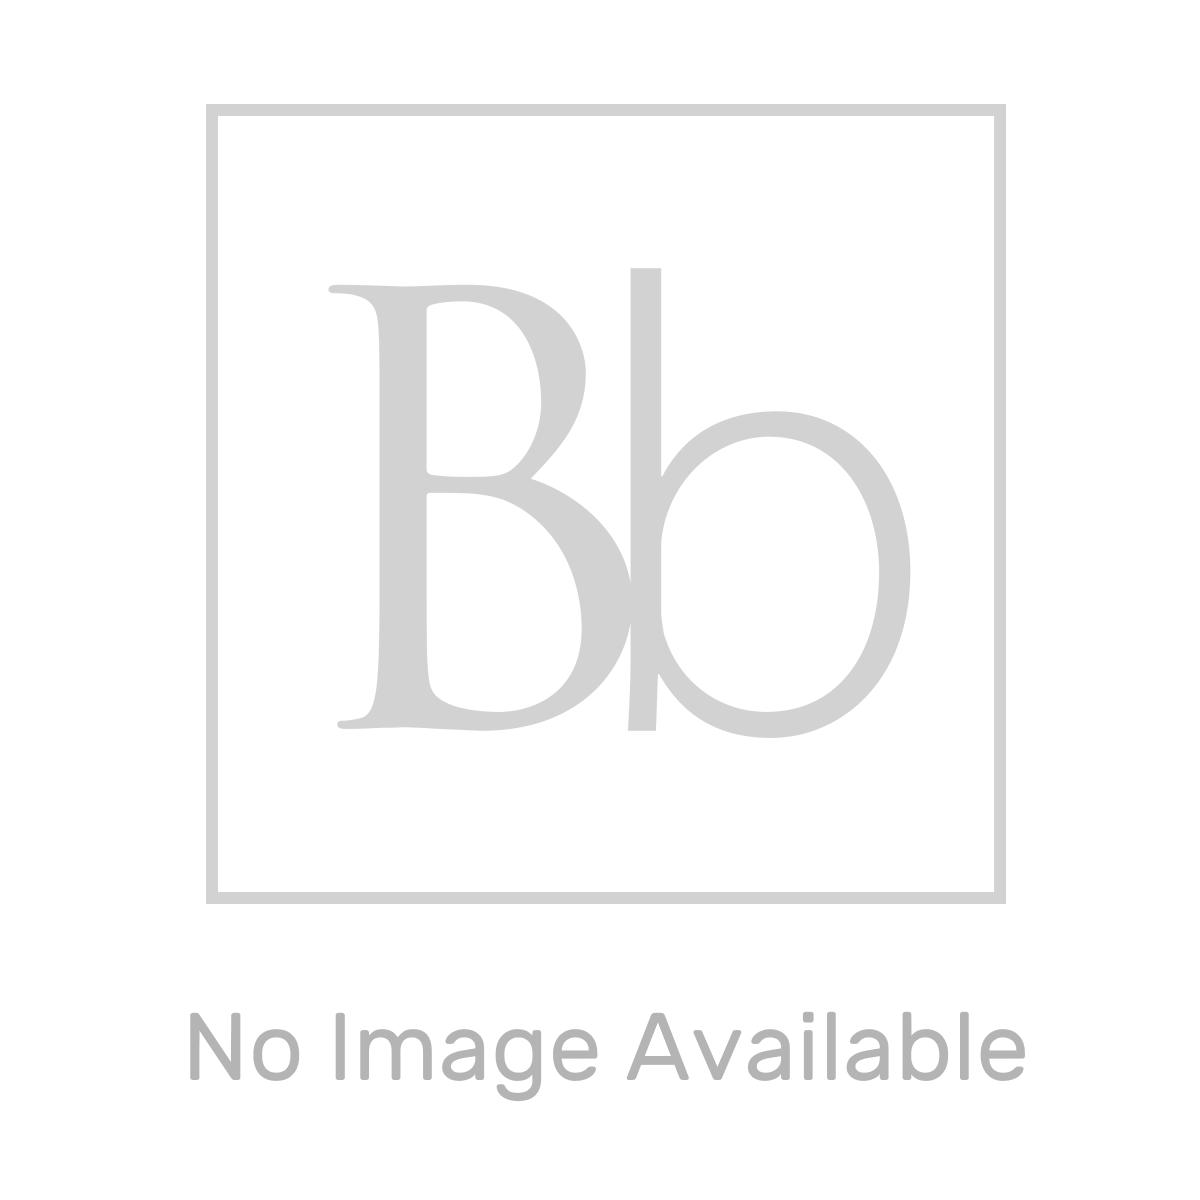 Classi Seal extra wide bath sealant tape